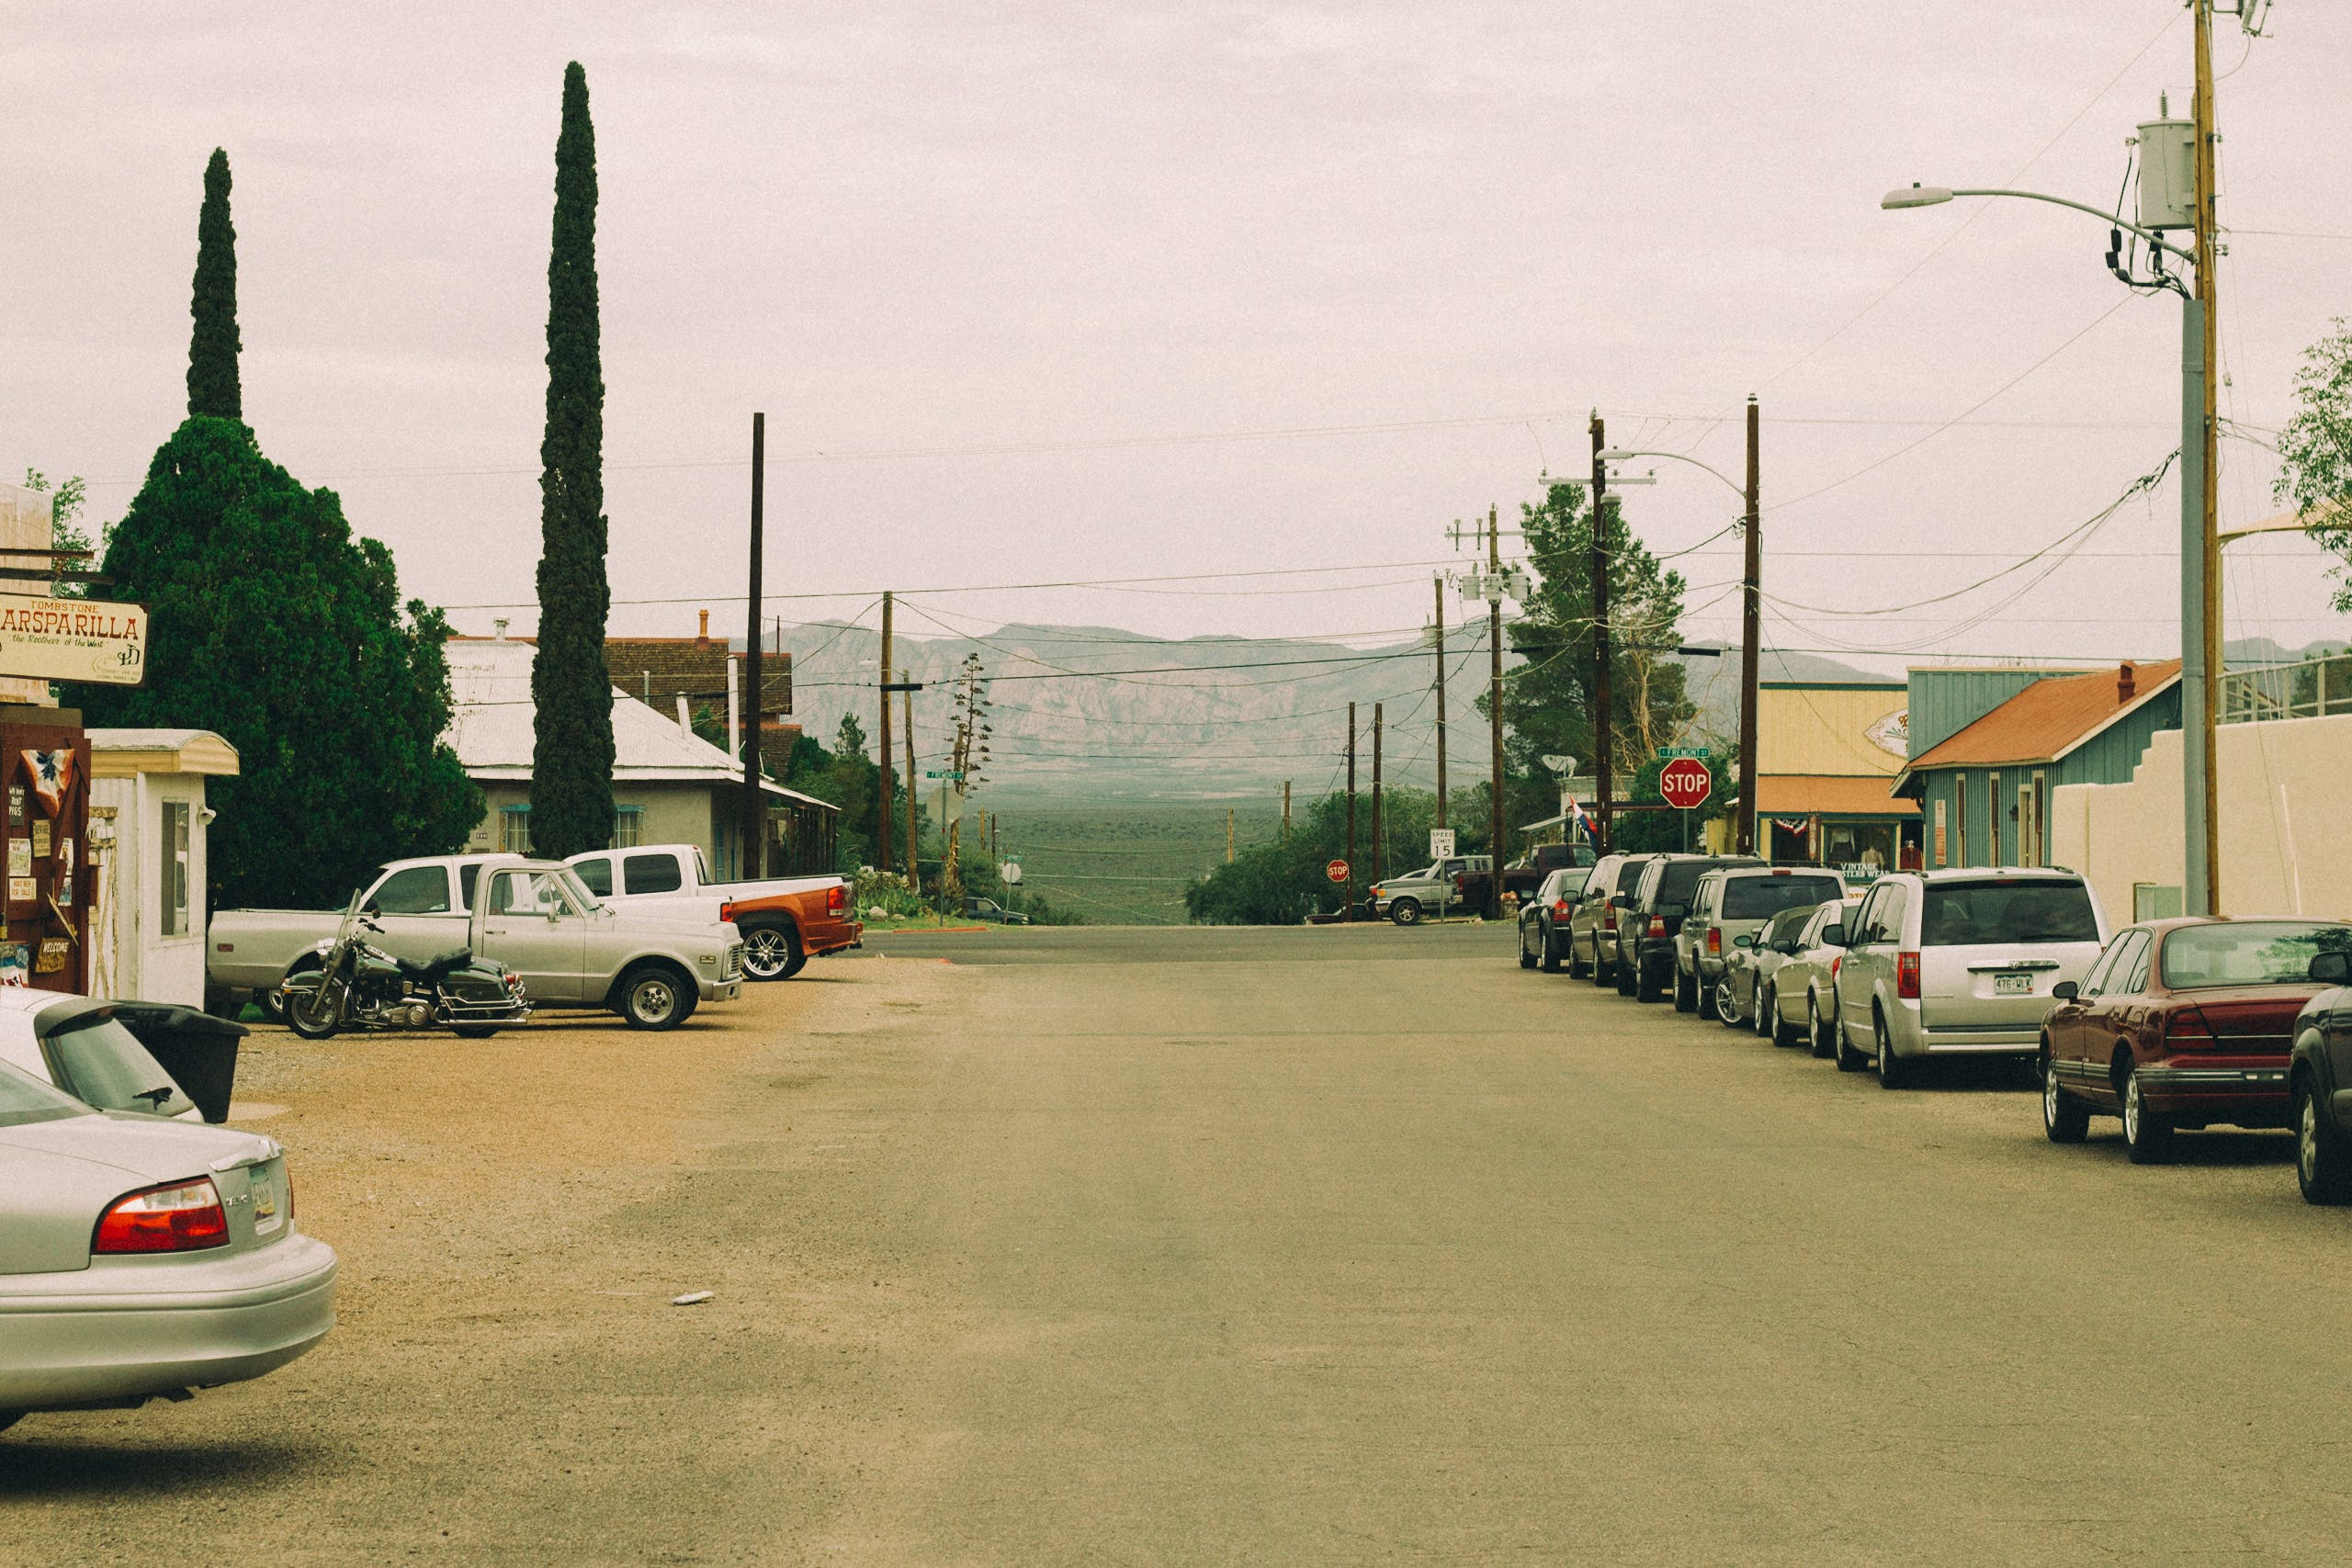 cars, daylight, environment